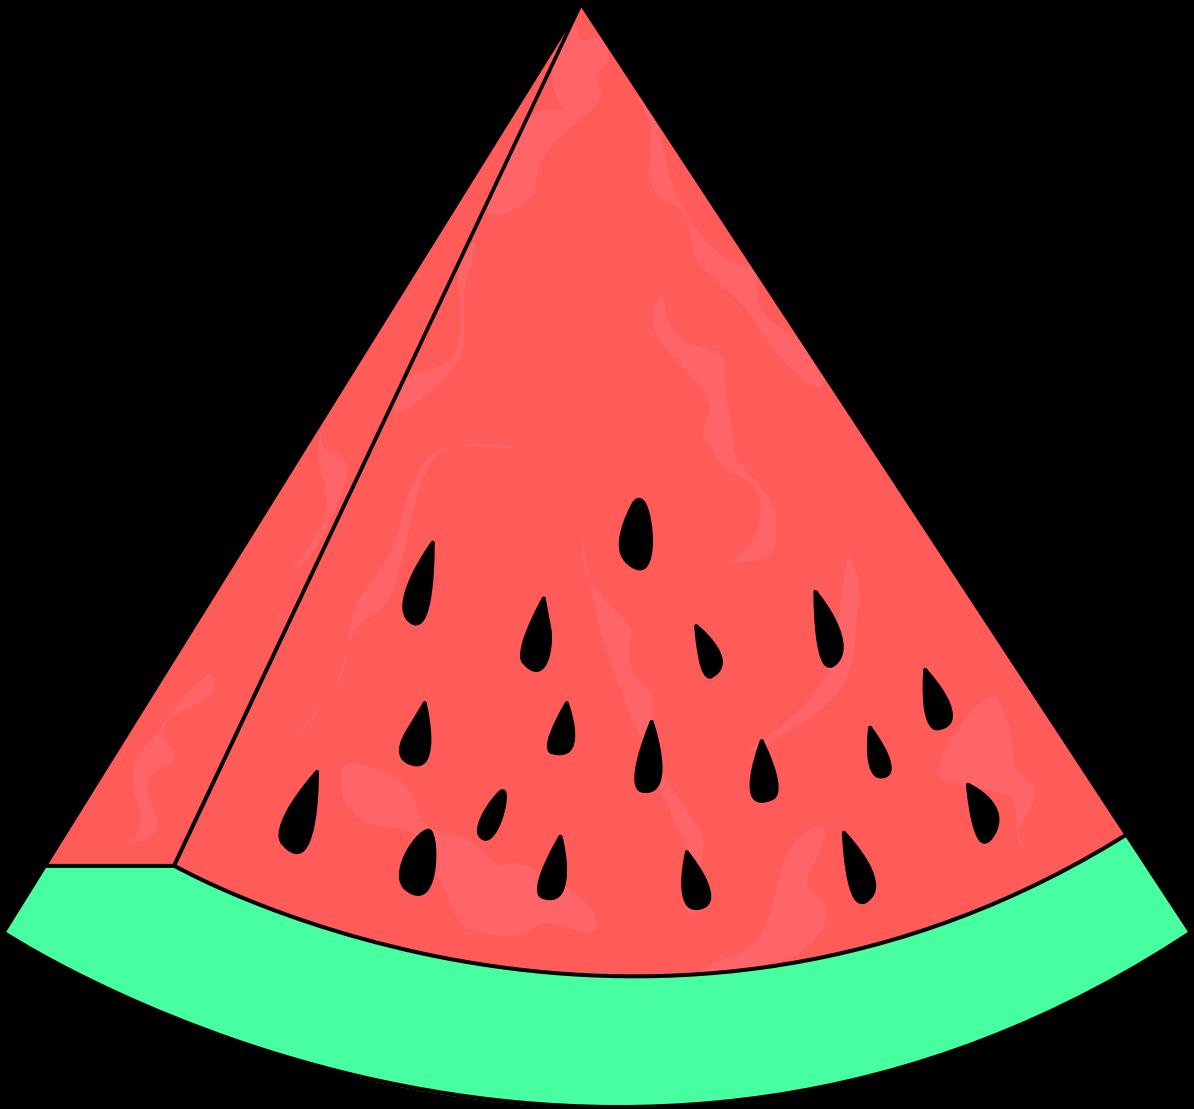 1194x1109 Watermelon clip art free clipart images 4 clipartandscrap 2